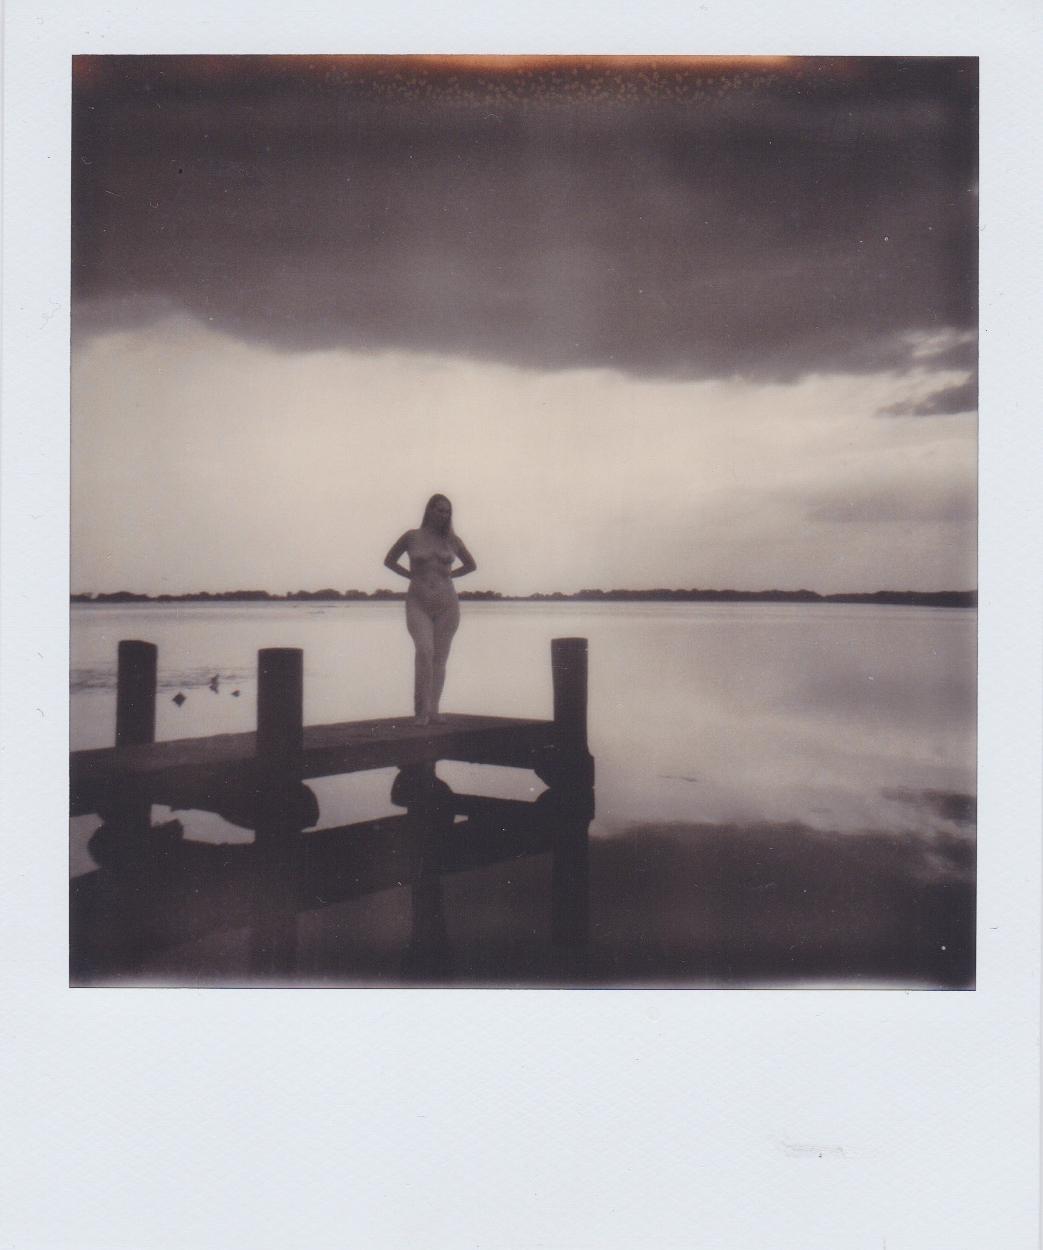 Polaroid project Day 4-3 by JW Purdy